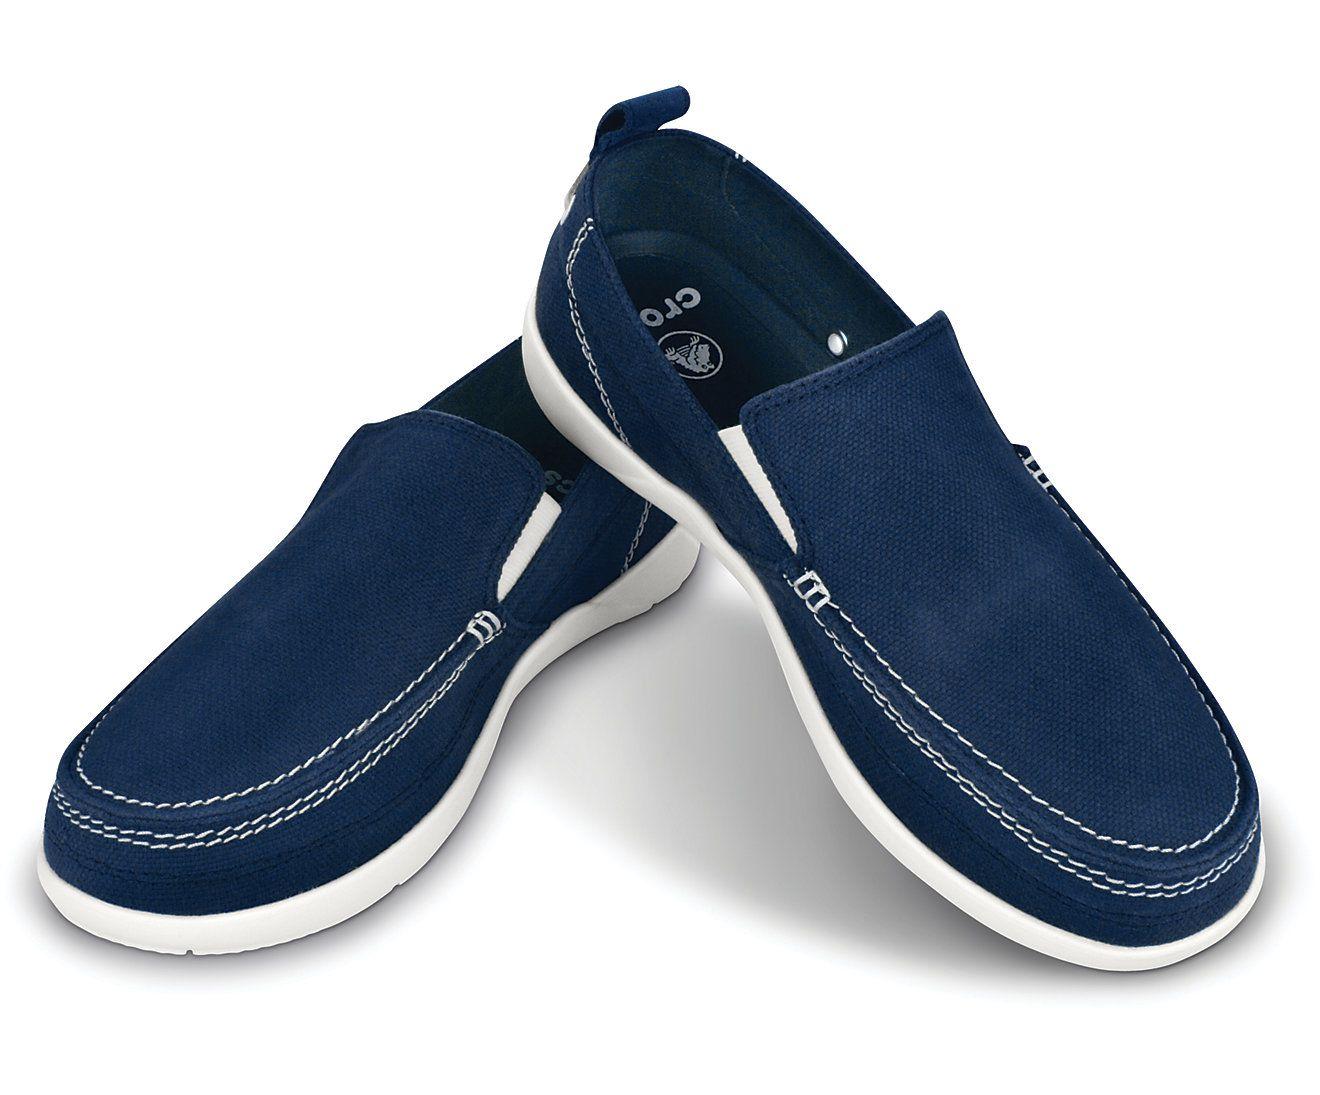 84106b571 Sapato Crocs Masculino Walu Men - Navy - Titanes Esportes